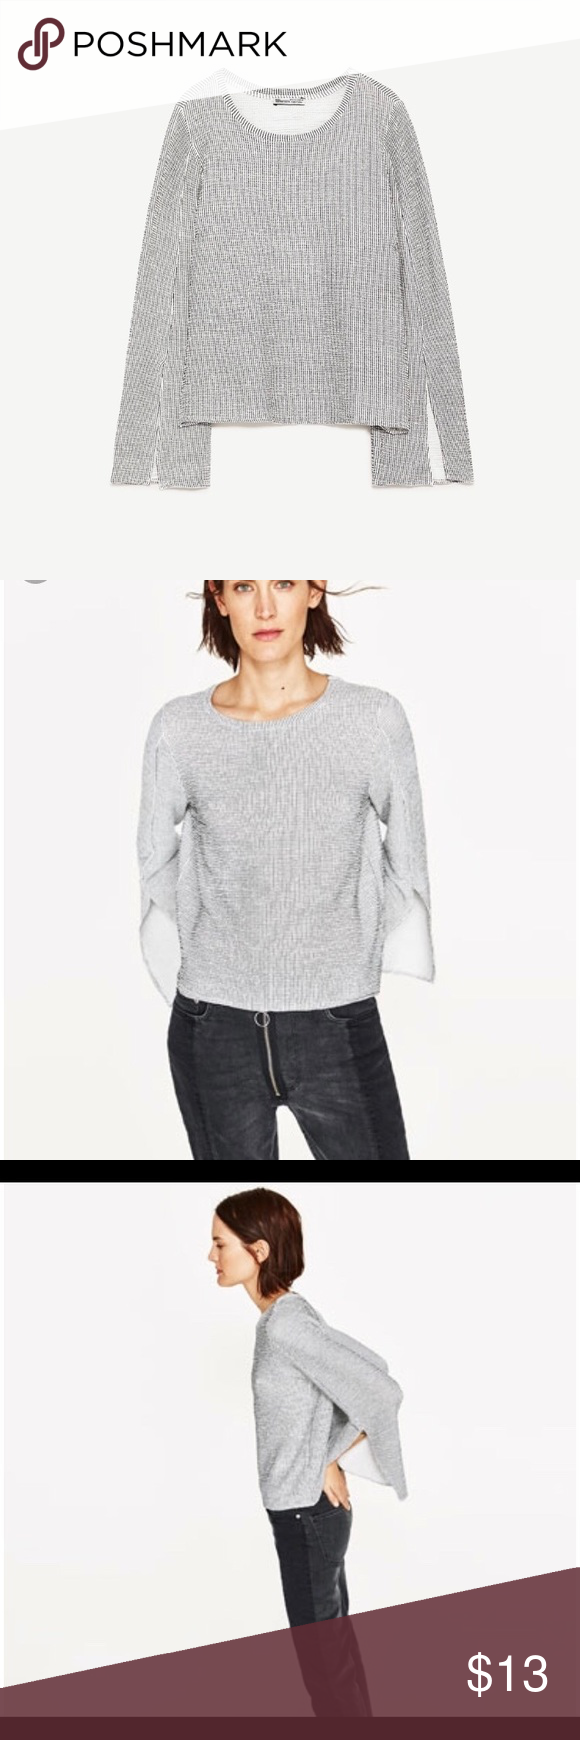 889f917a244e2 Open sleeve Jacquard top Open sleeve jacquard top from Zara Zara Tops Tees  - Long Sleeve